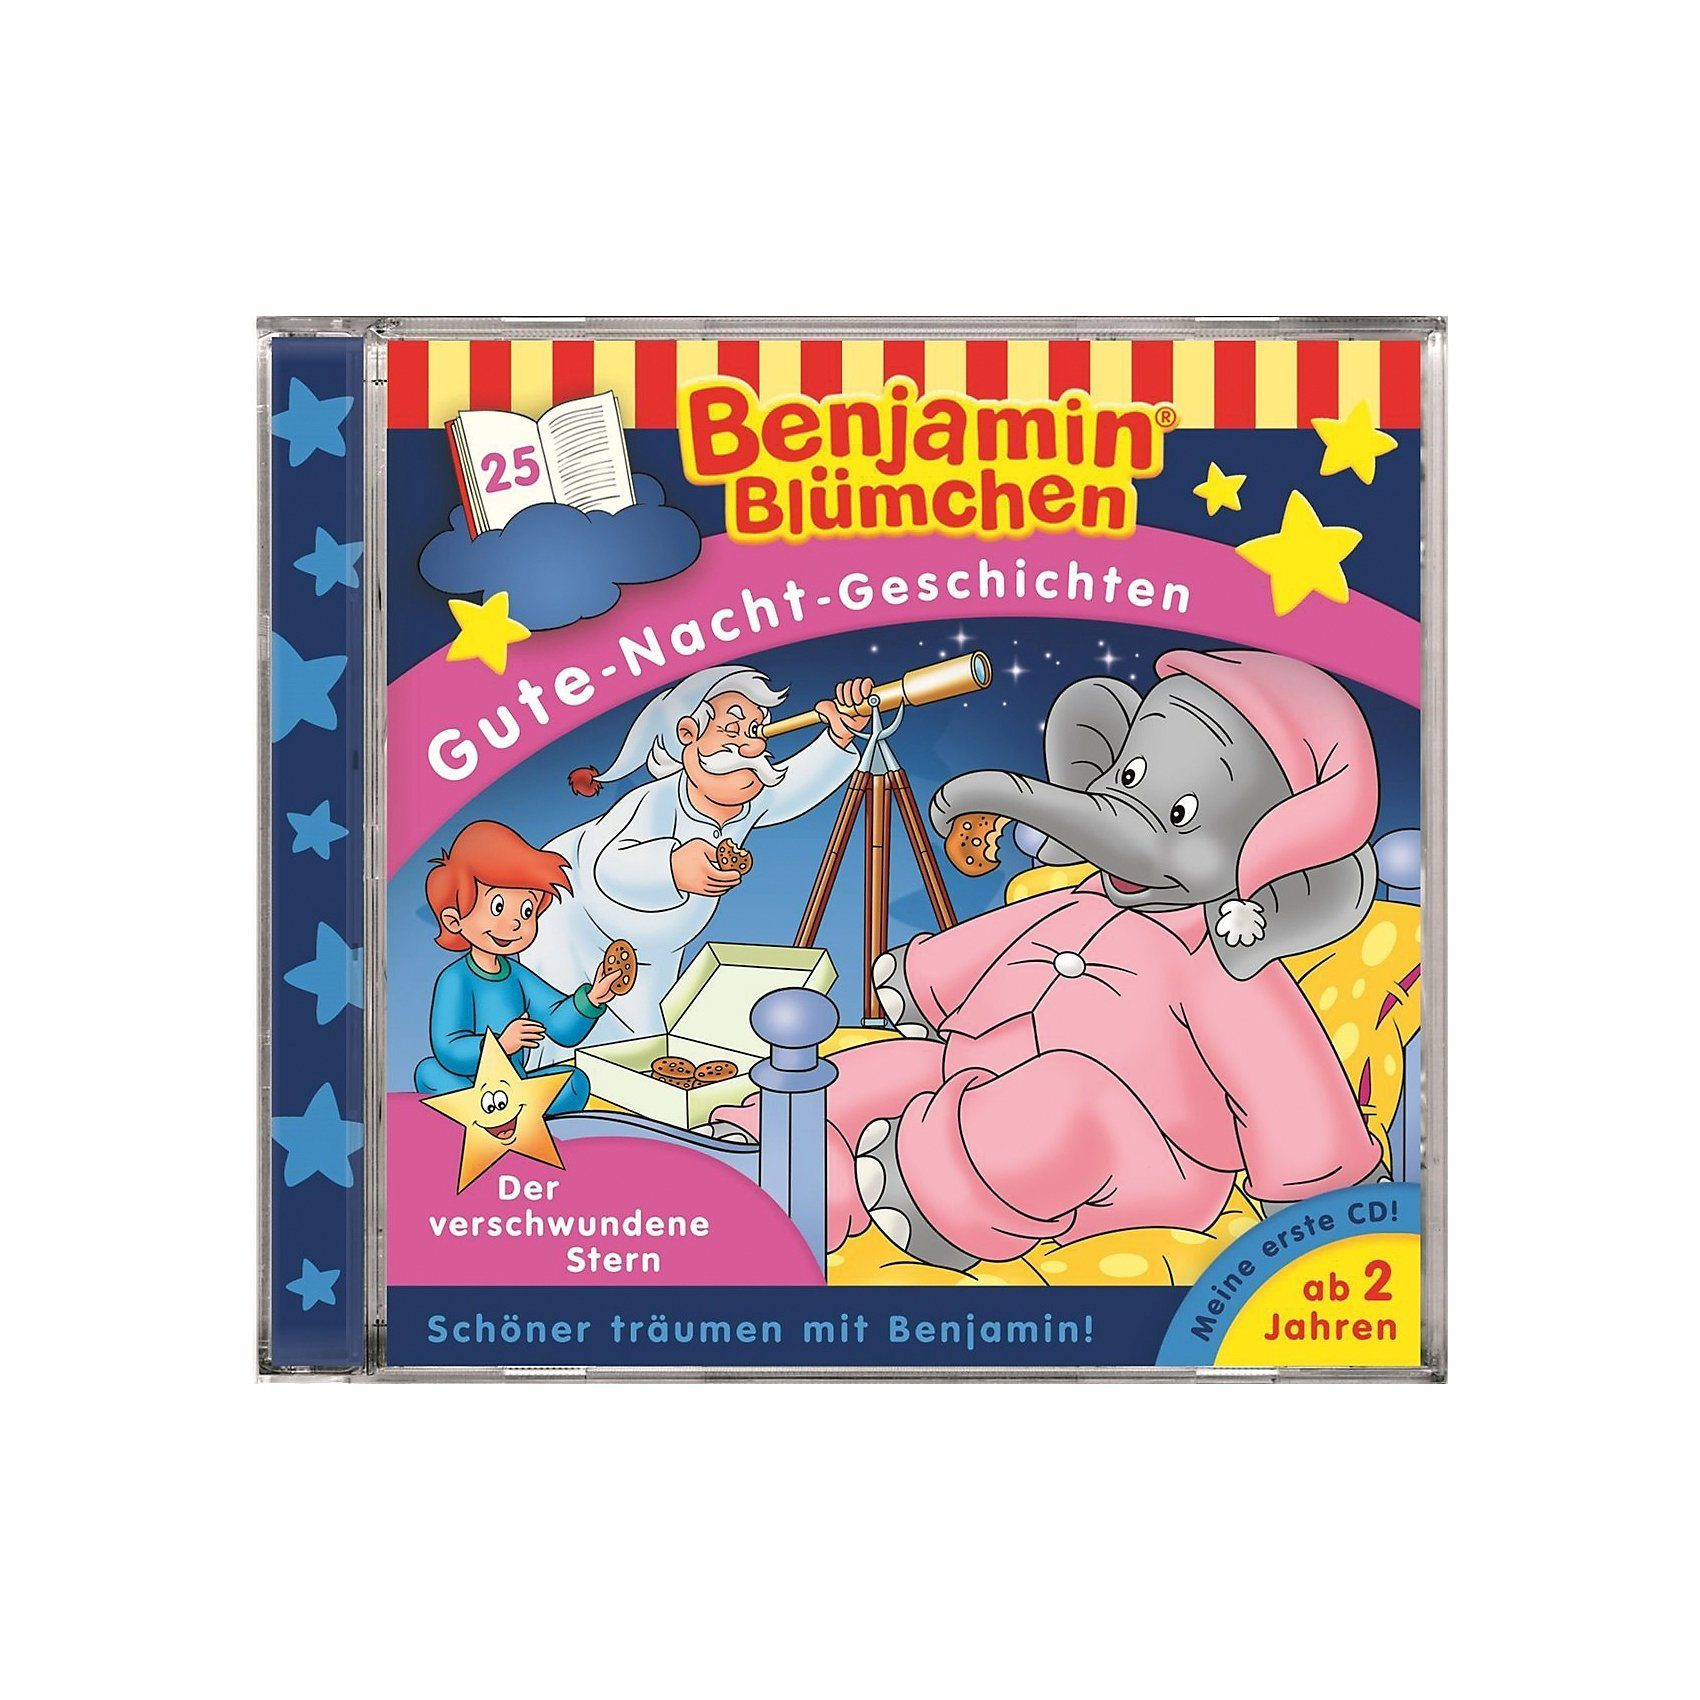 Kiddinx CD Benjamin Blümchen, Gute-Nacht-Geschichten - Der verschwun